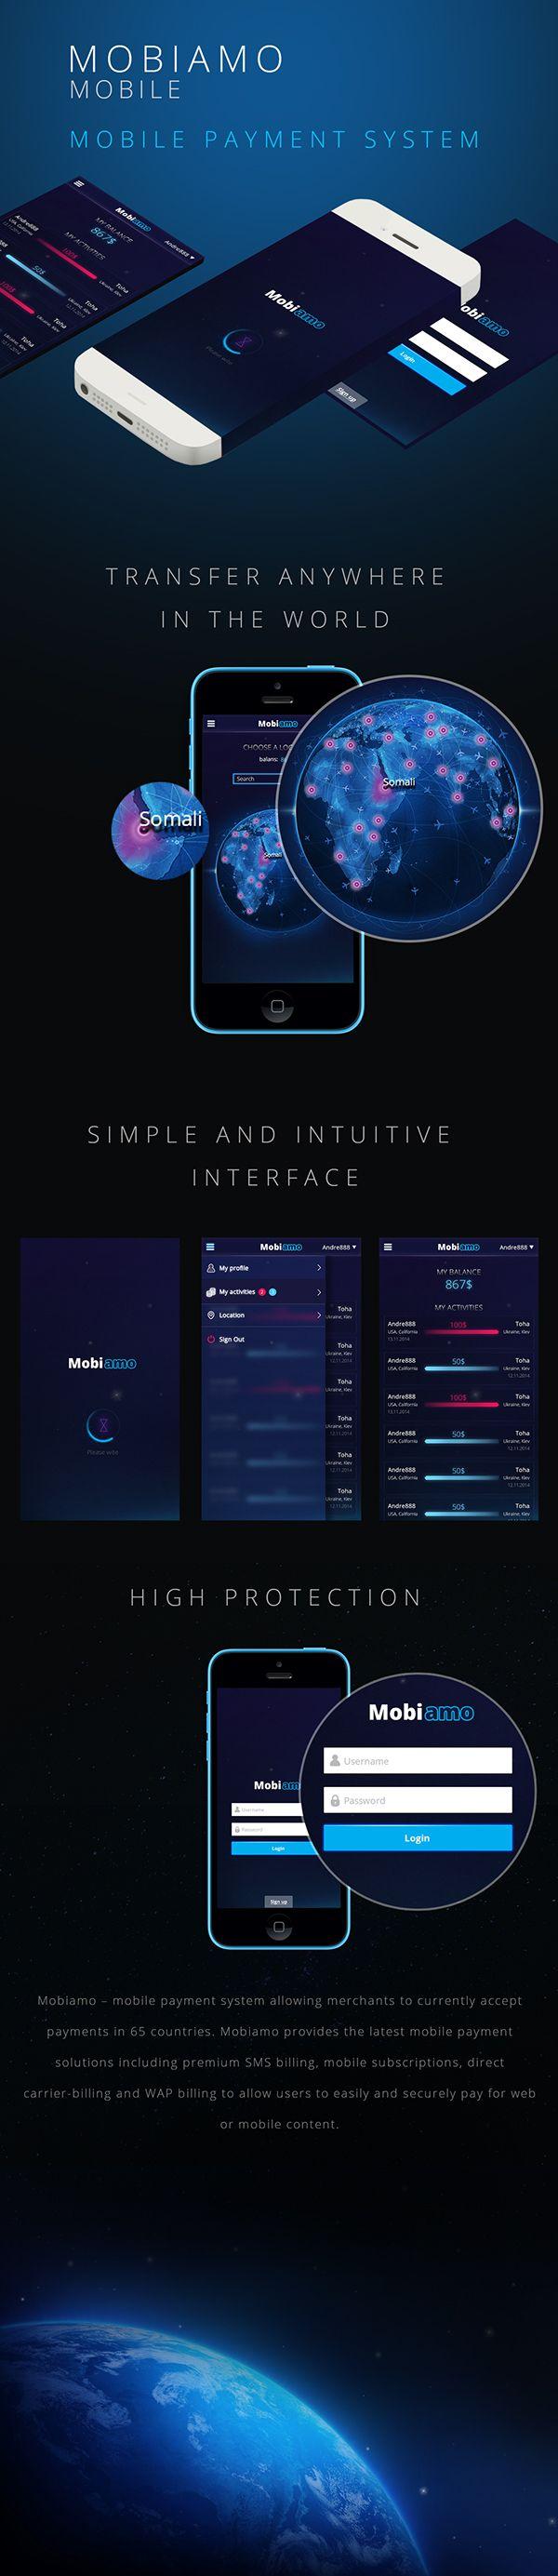 Unique App Design, Mobiamo via @vbrekalo #App #Design